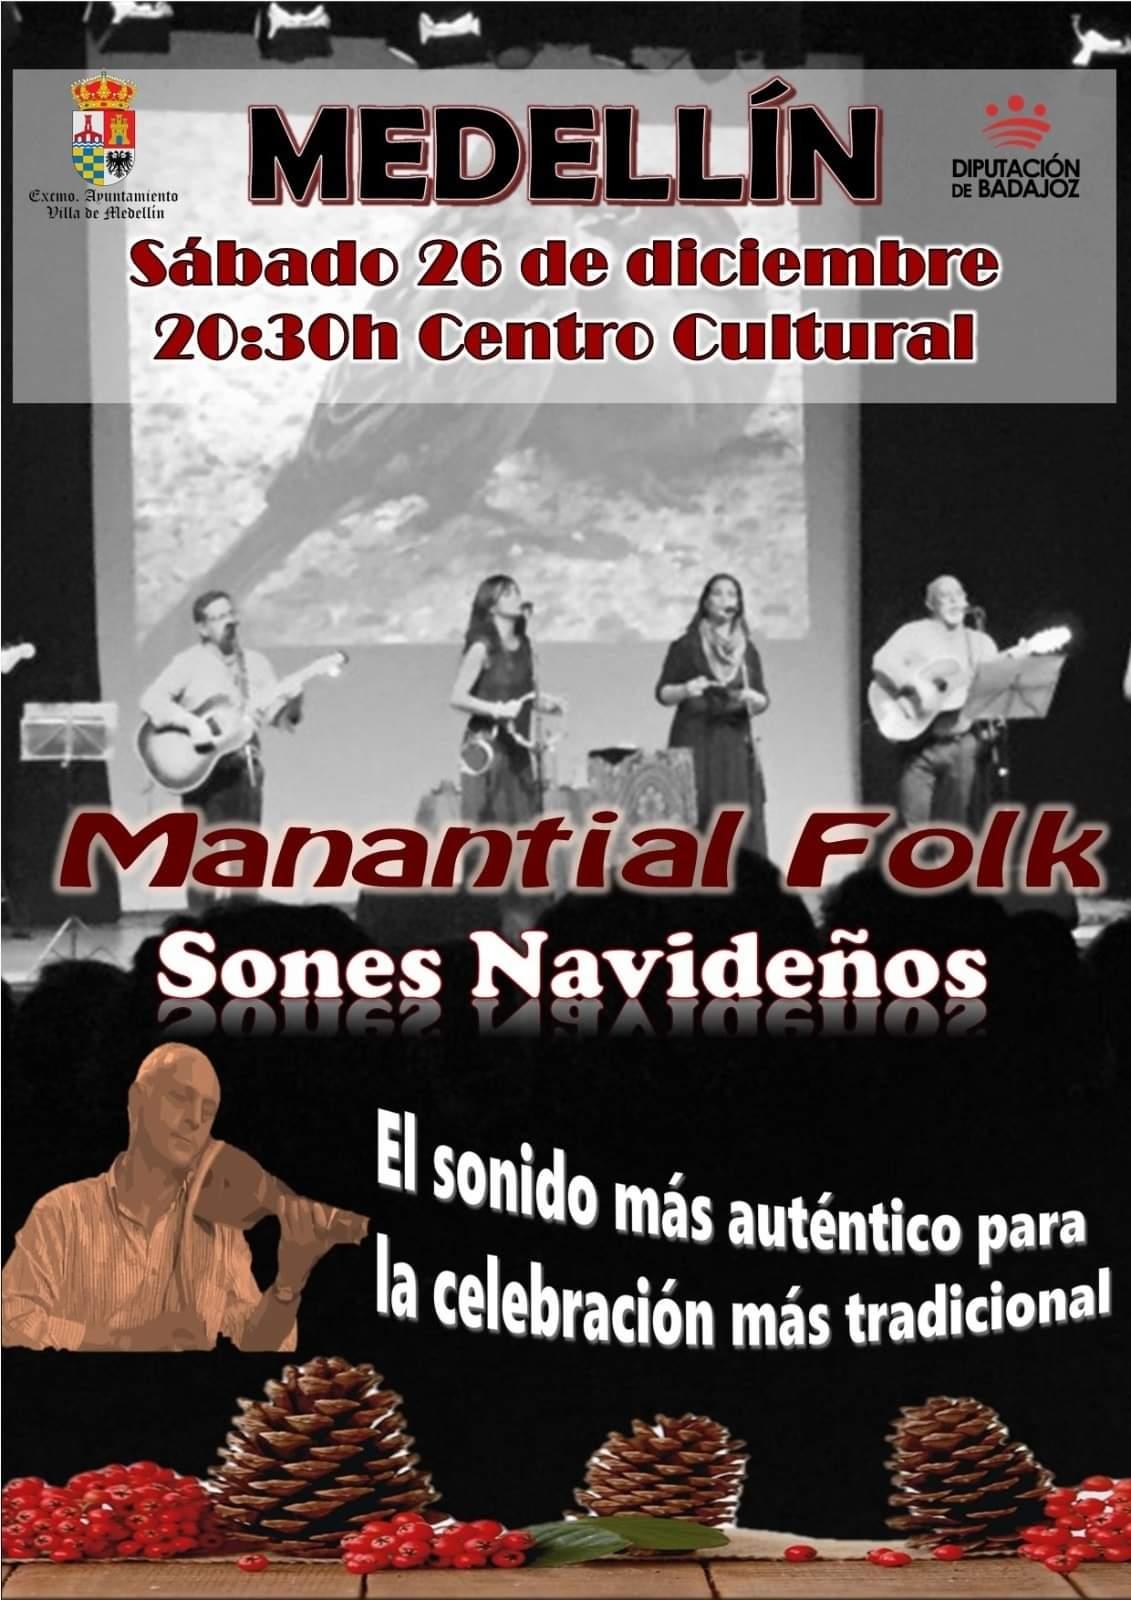 Manantial Folk (2020) - Medellín (Badajoz)